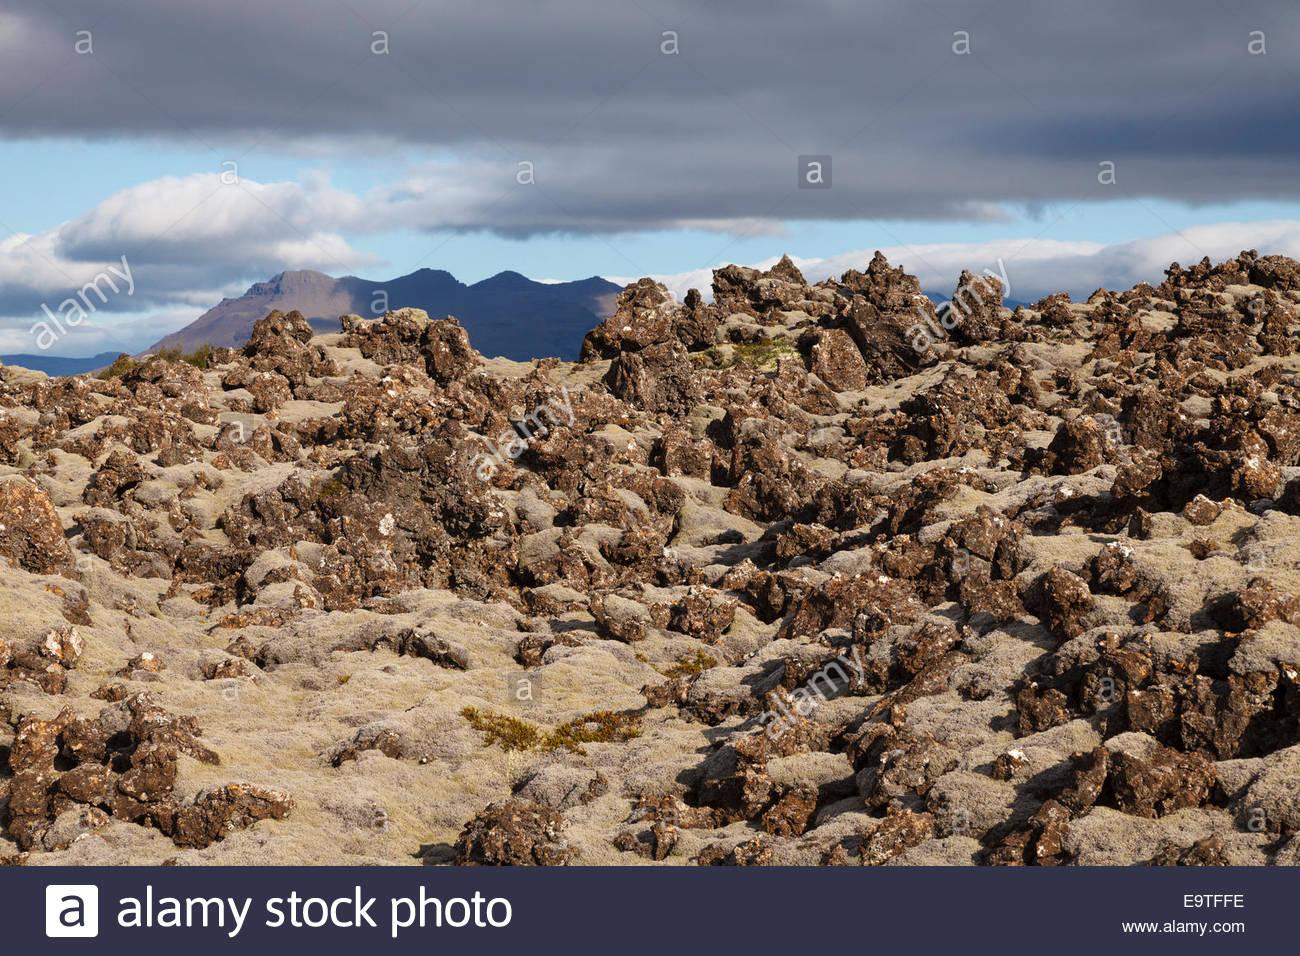 Barnaborgir, a lava field at the entrance of the Snæfellsnes peninsula - Stock Image